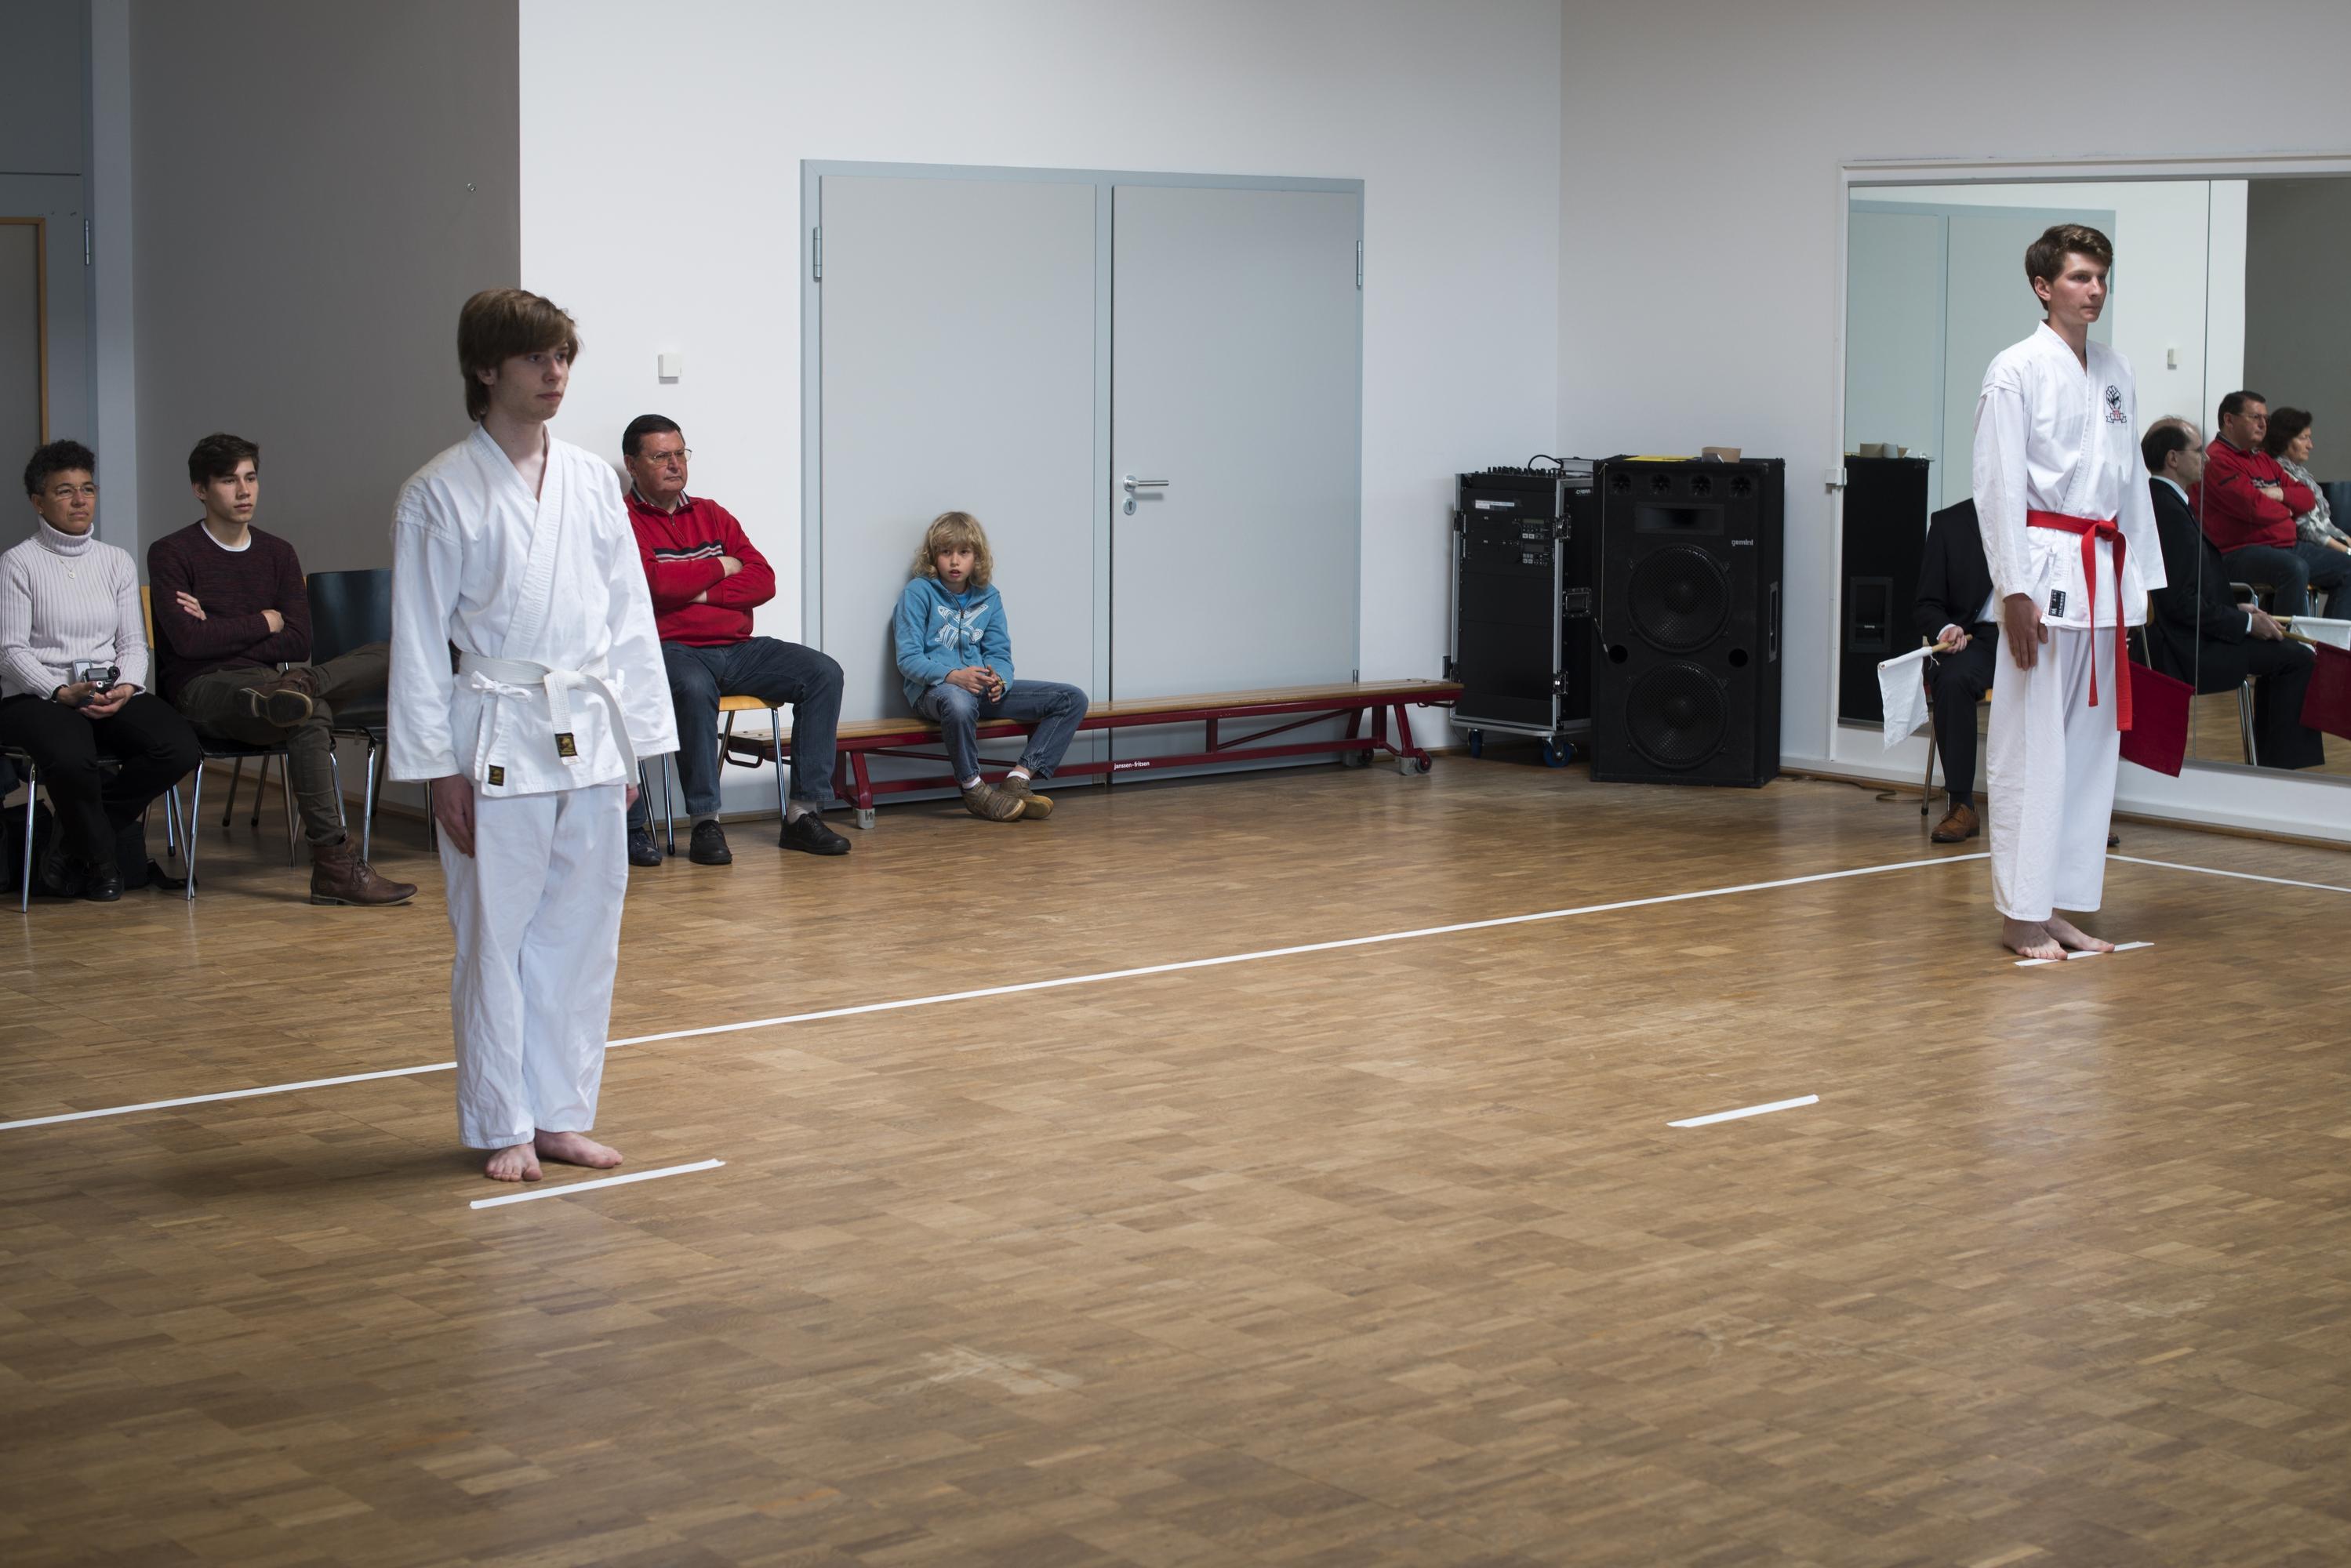 2016-04-26 Kata Turnier Kaarst 083